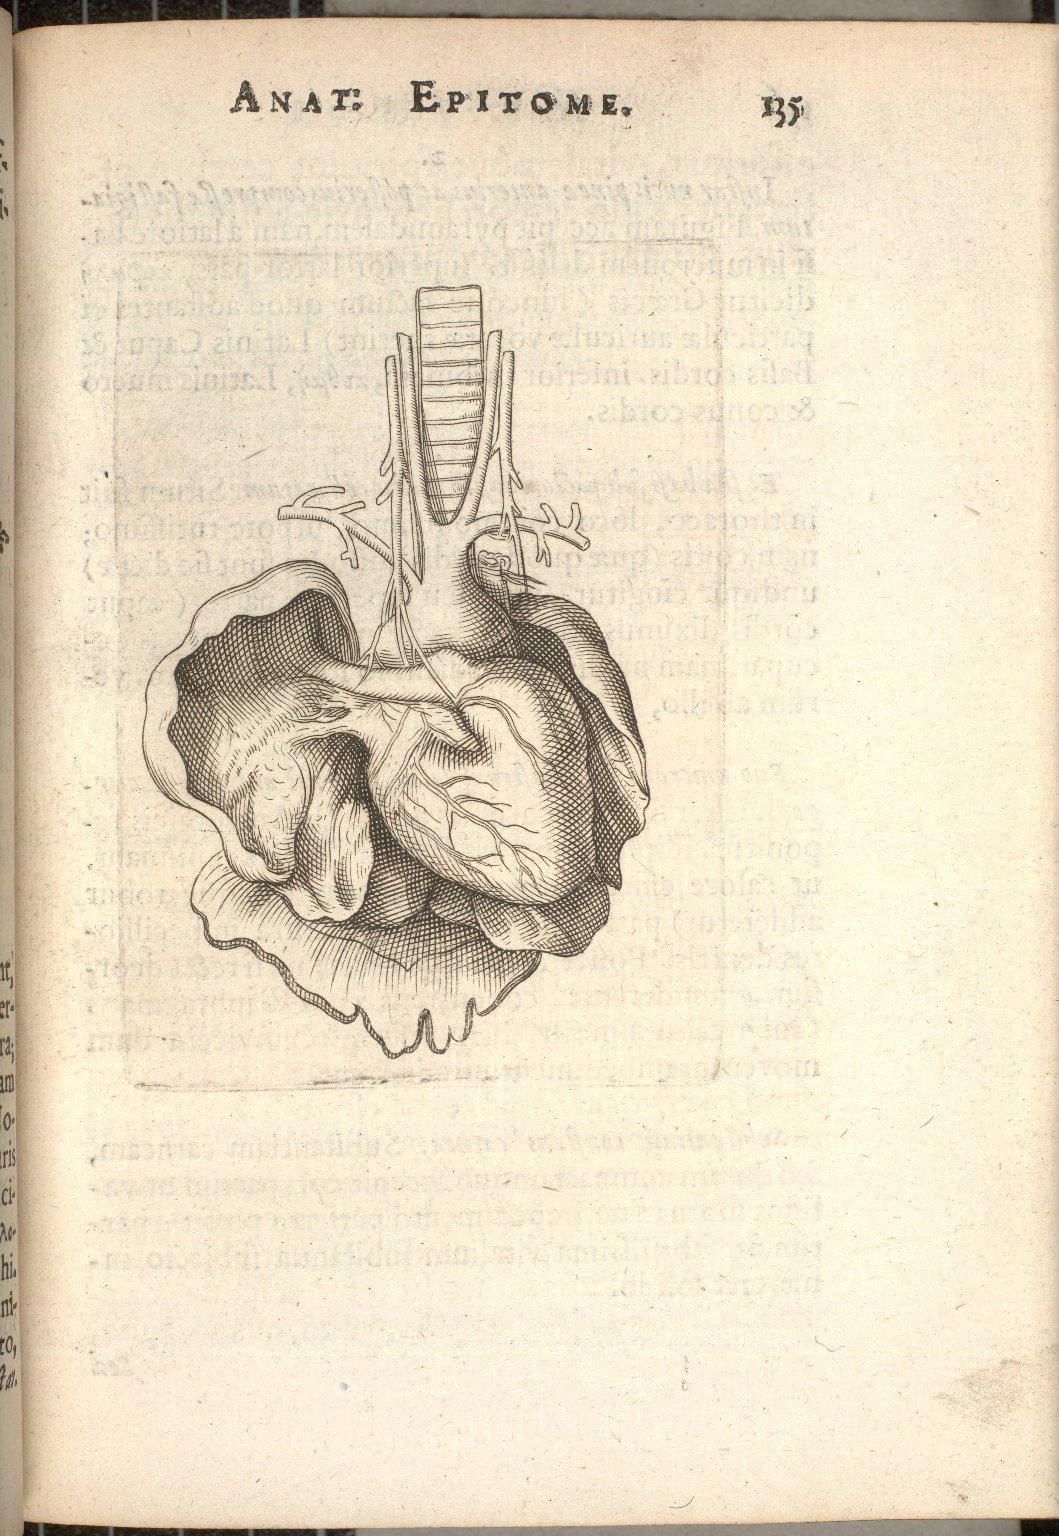 [left side of the heart]